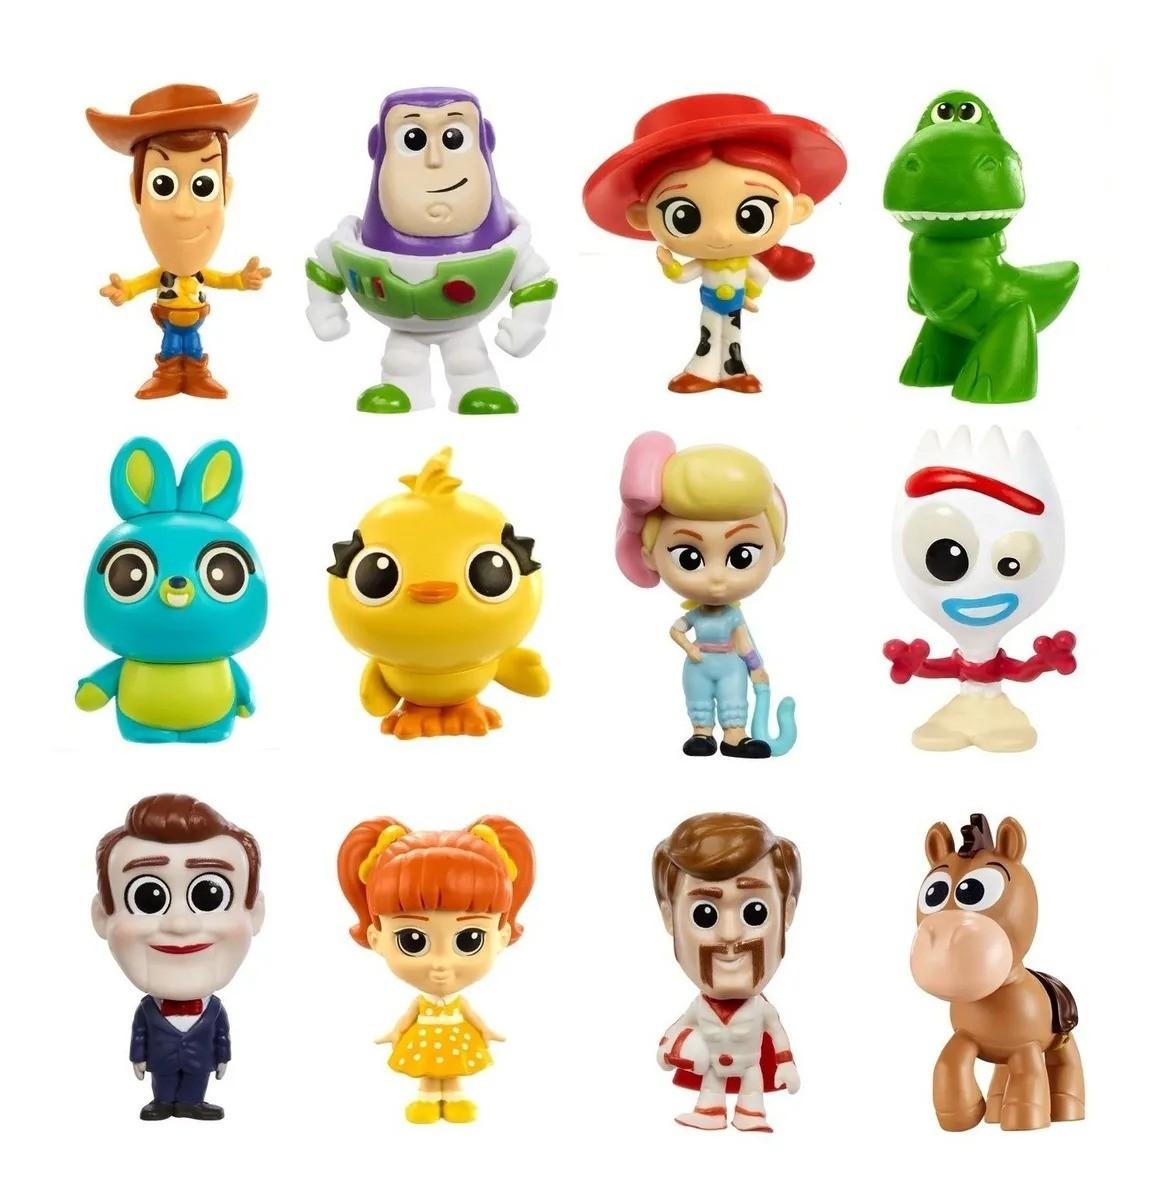 Conjunto Com 12 Mini Figuras Colecionaveis Toy Story 4 Disney Pixar Mattel